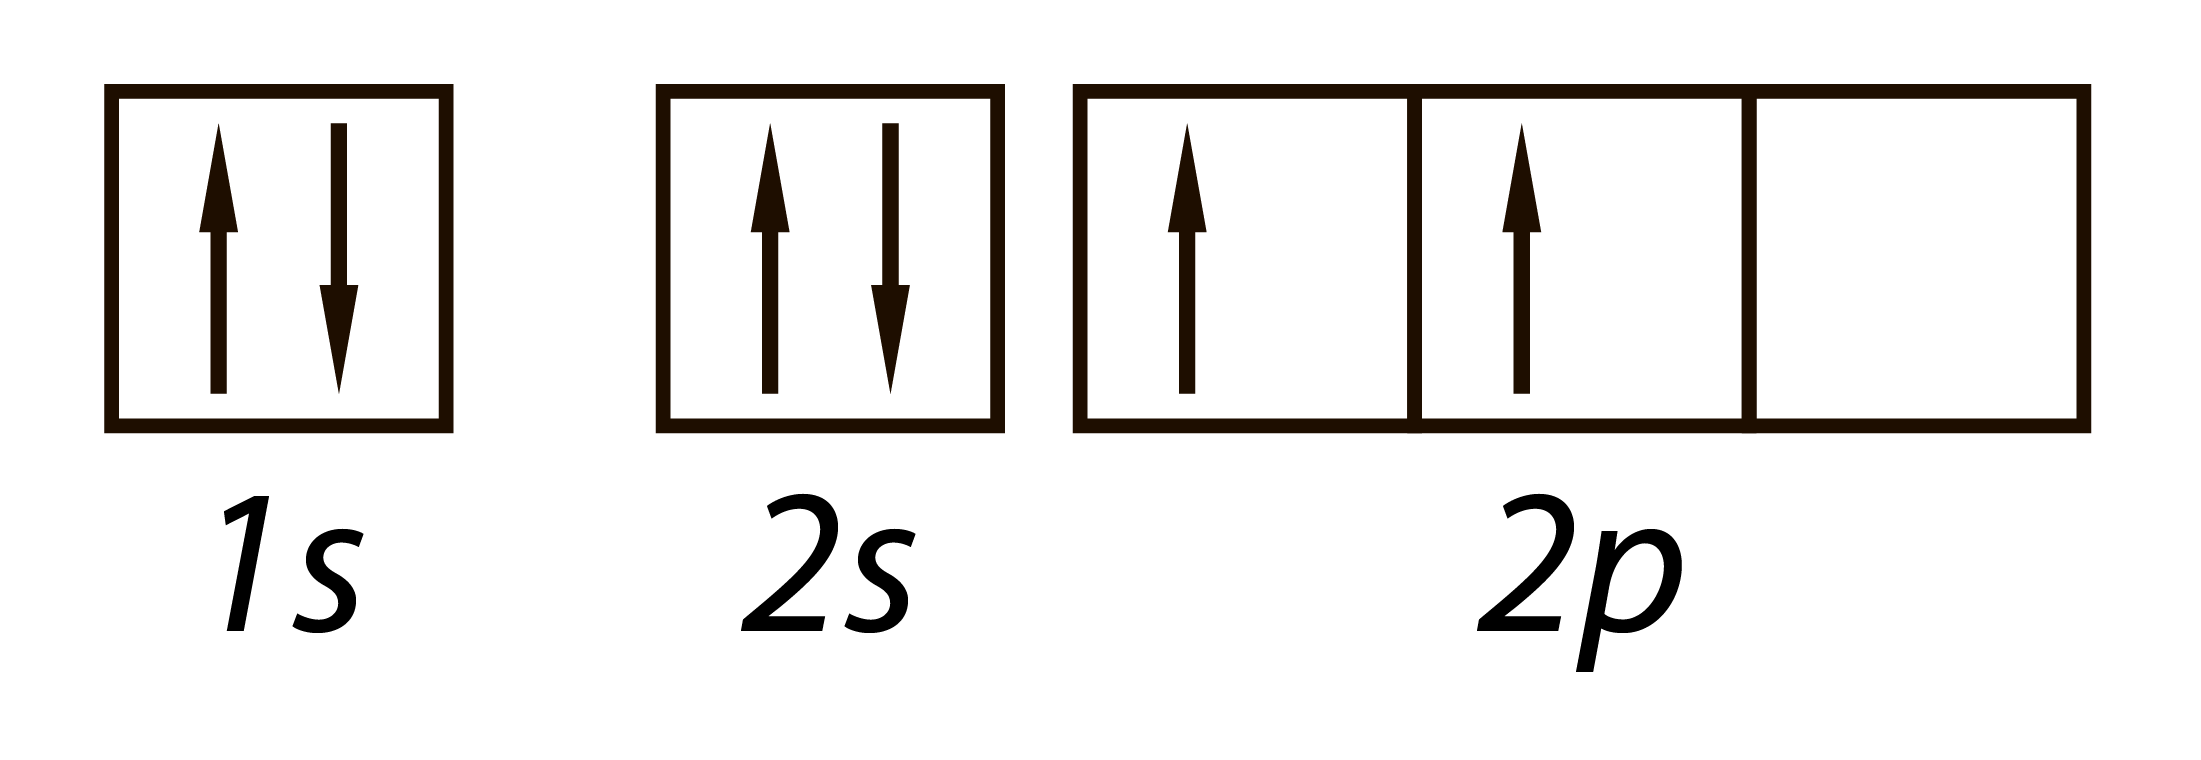 Схема атома углерода